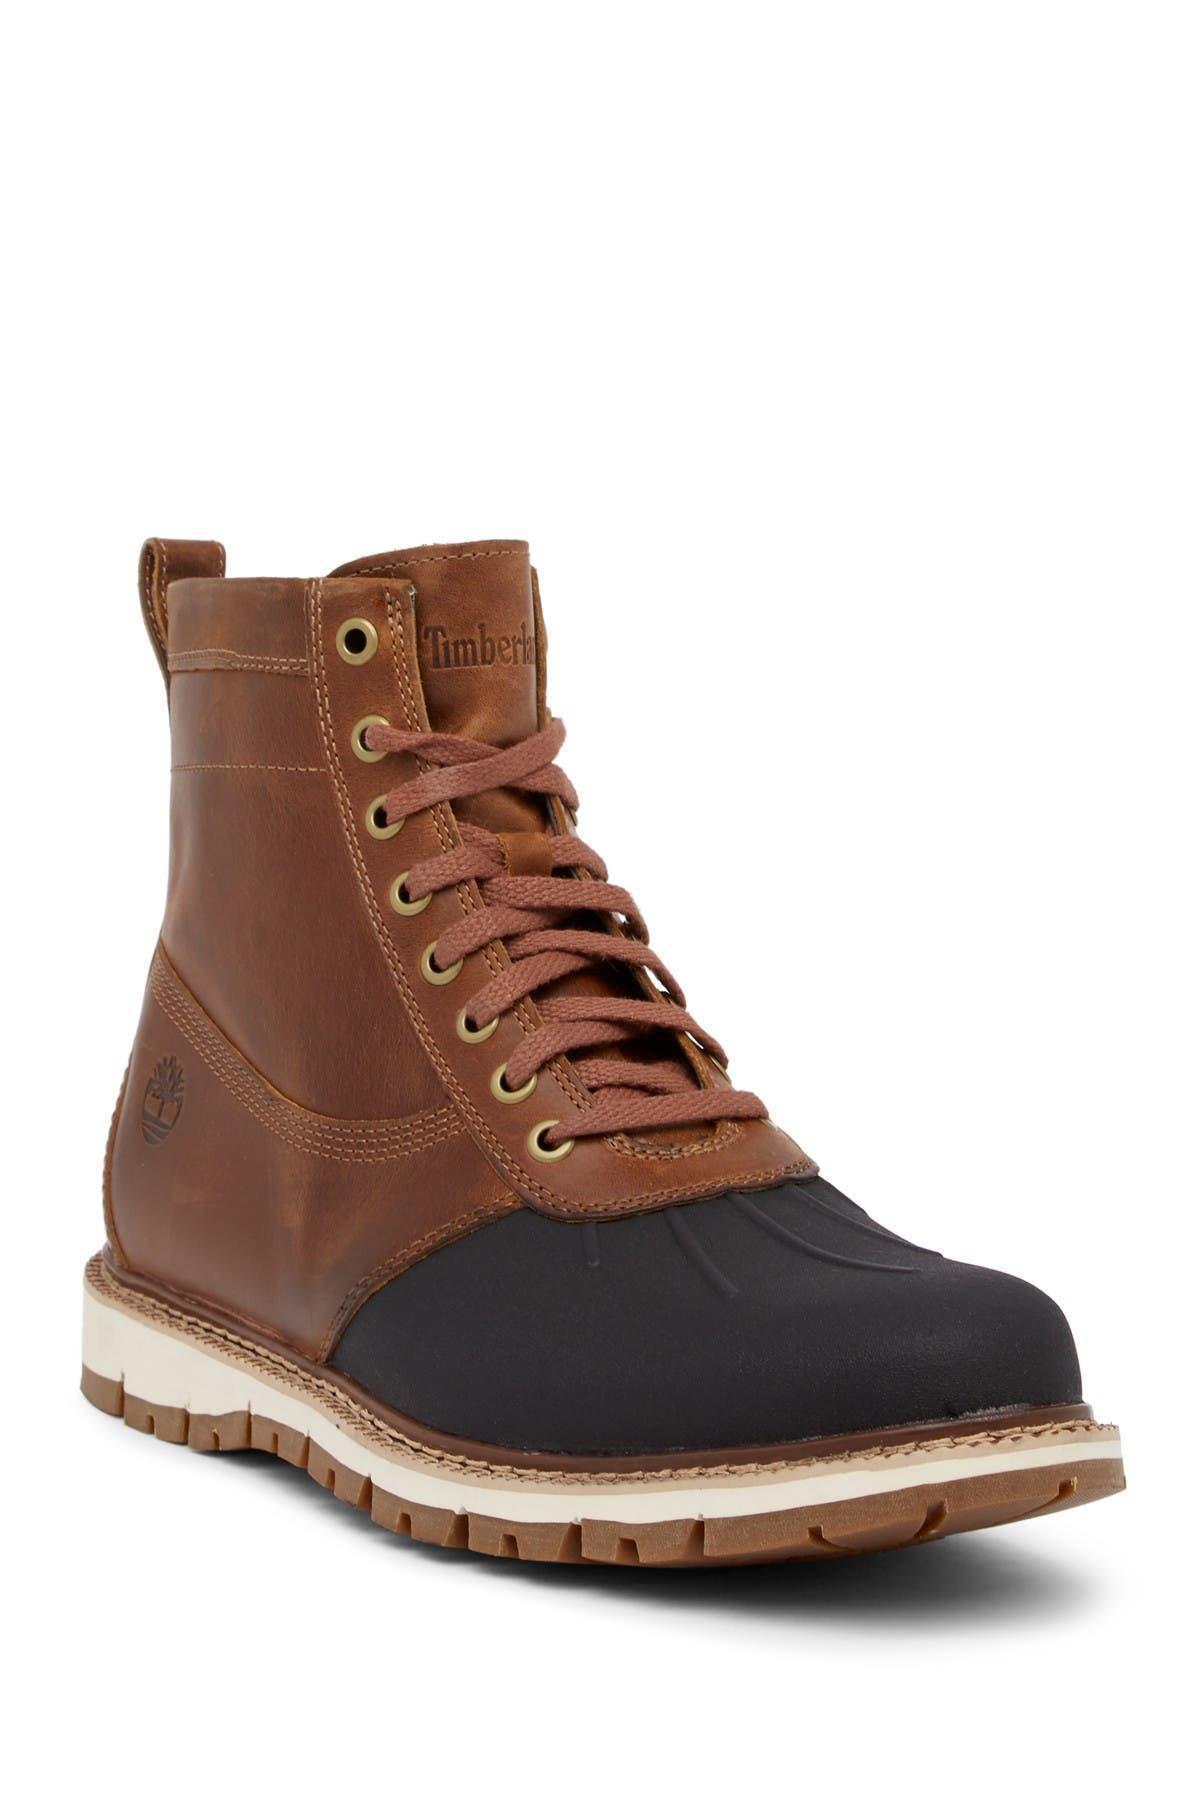 Timberland   Britton Hill Duck Boot